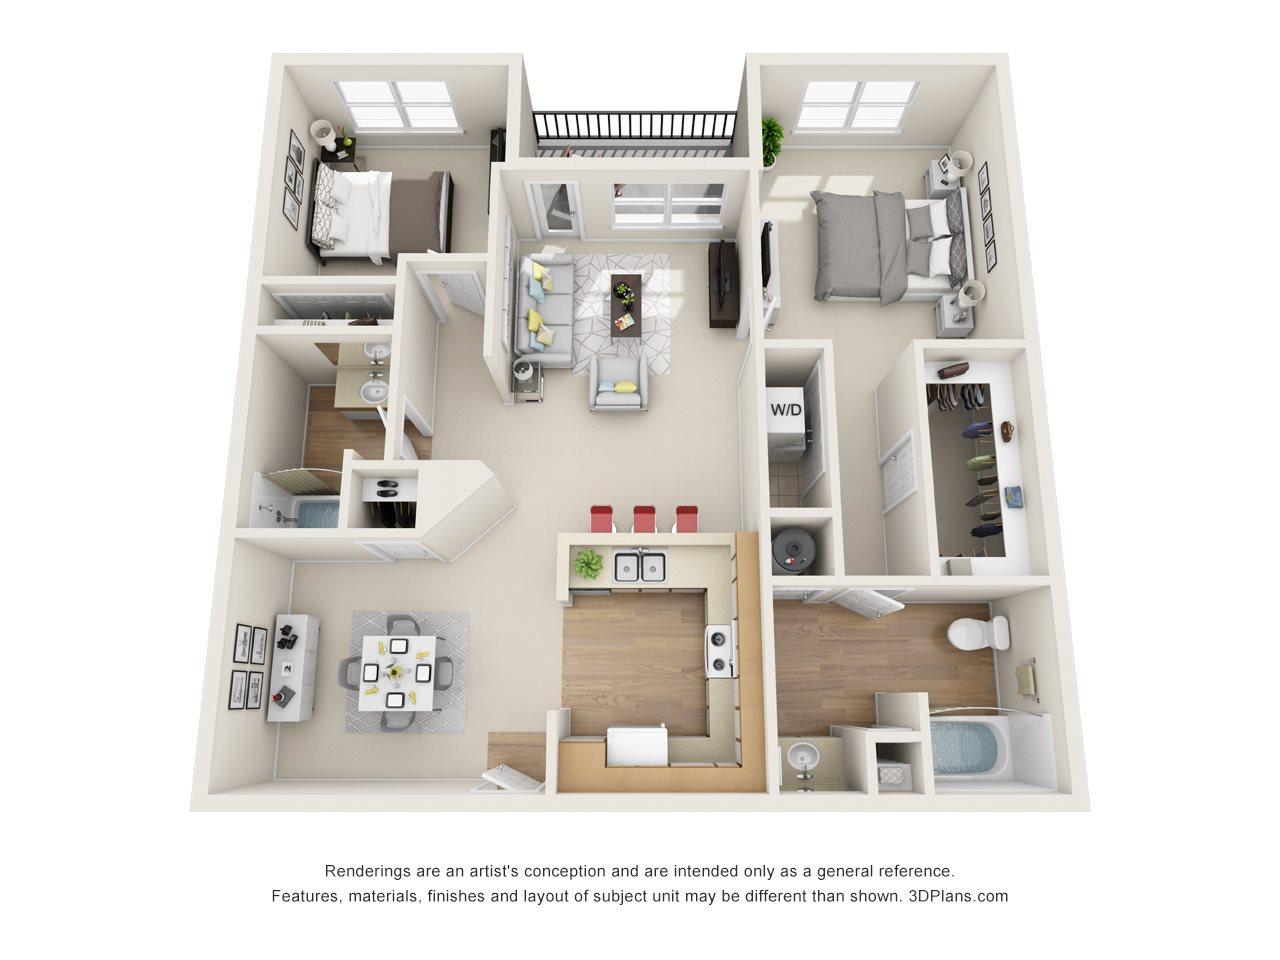 Redbud / Magnolia (2BR, 2BA) Floor Plan 3